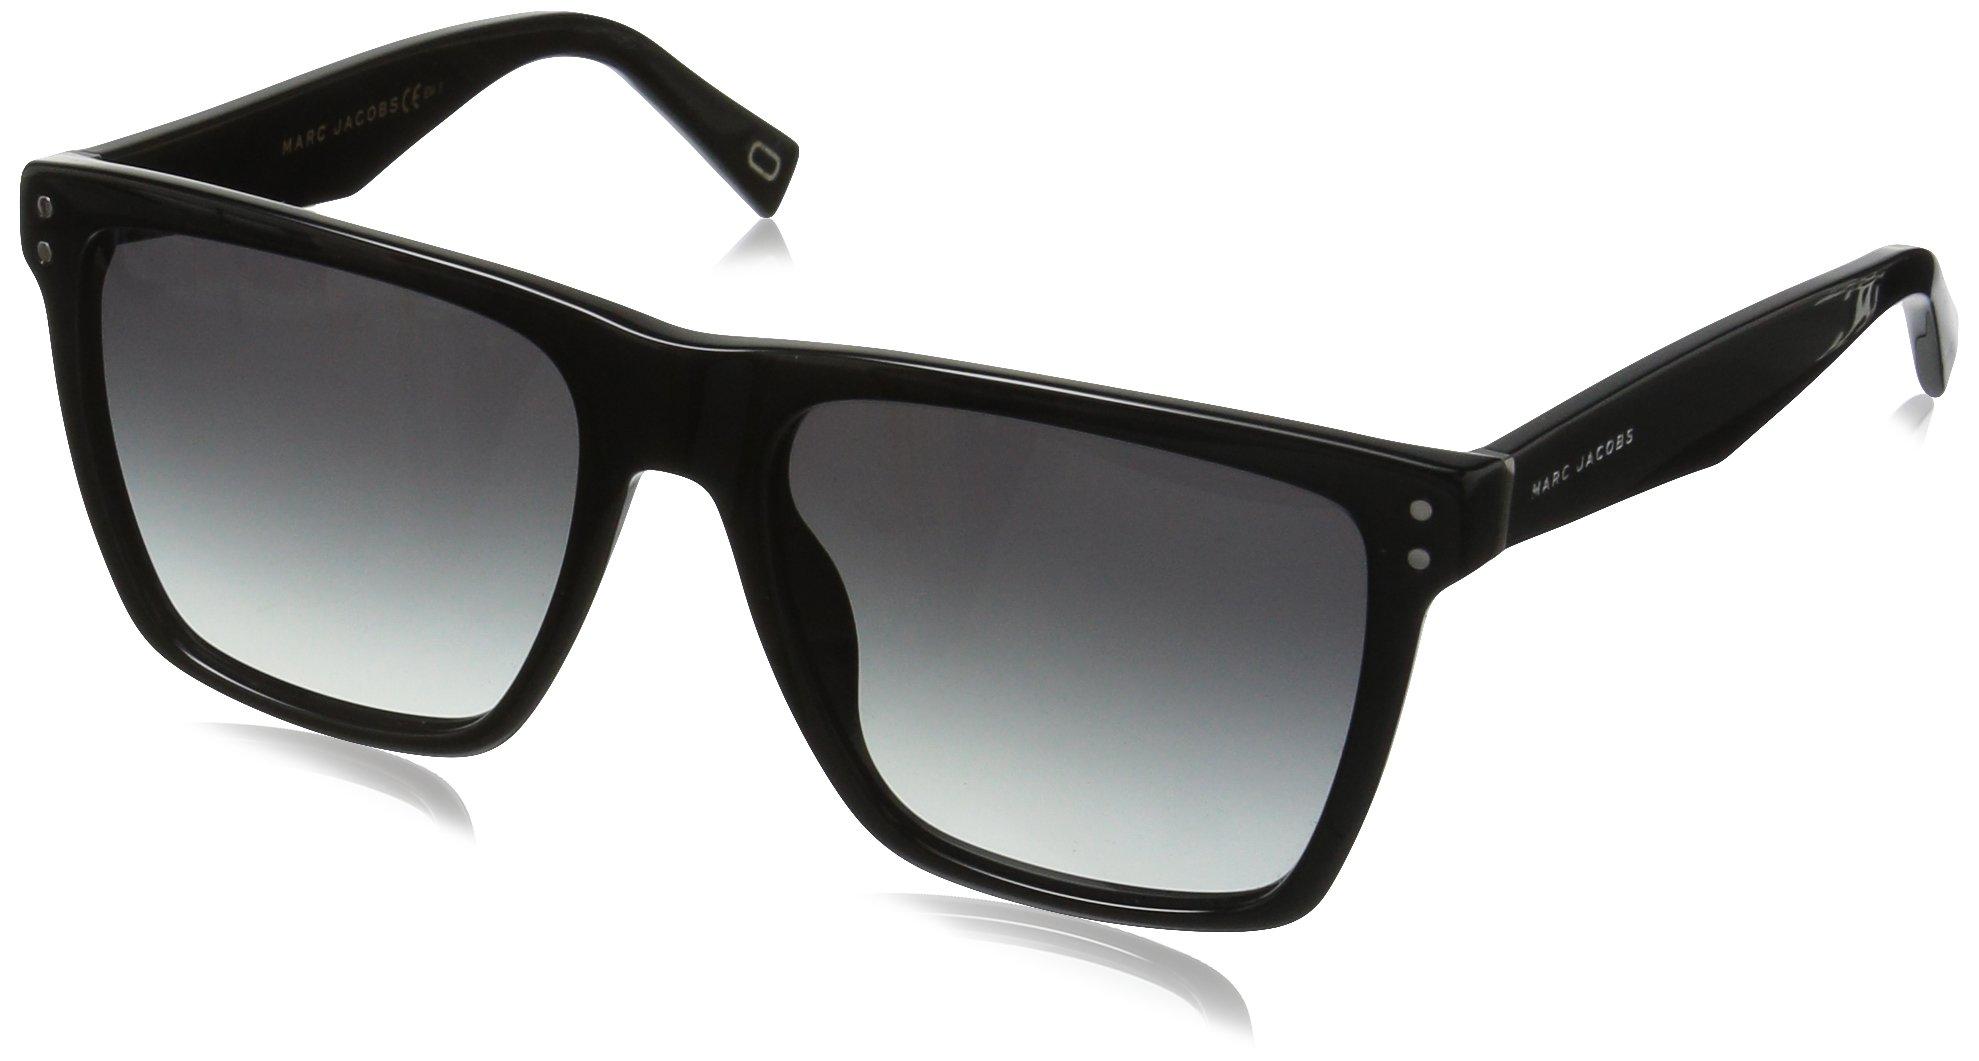 Marc Jacobs Women's Marc119s Square Sunglasses, Black/Dark Gray Gradient, 54 mm